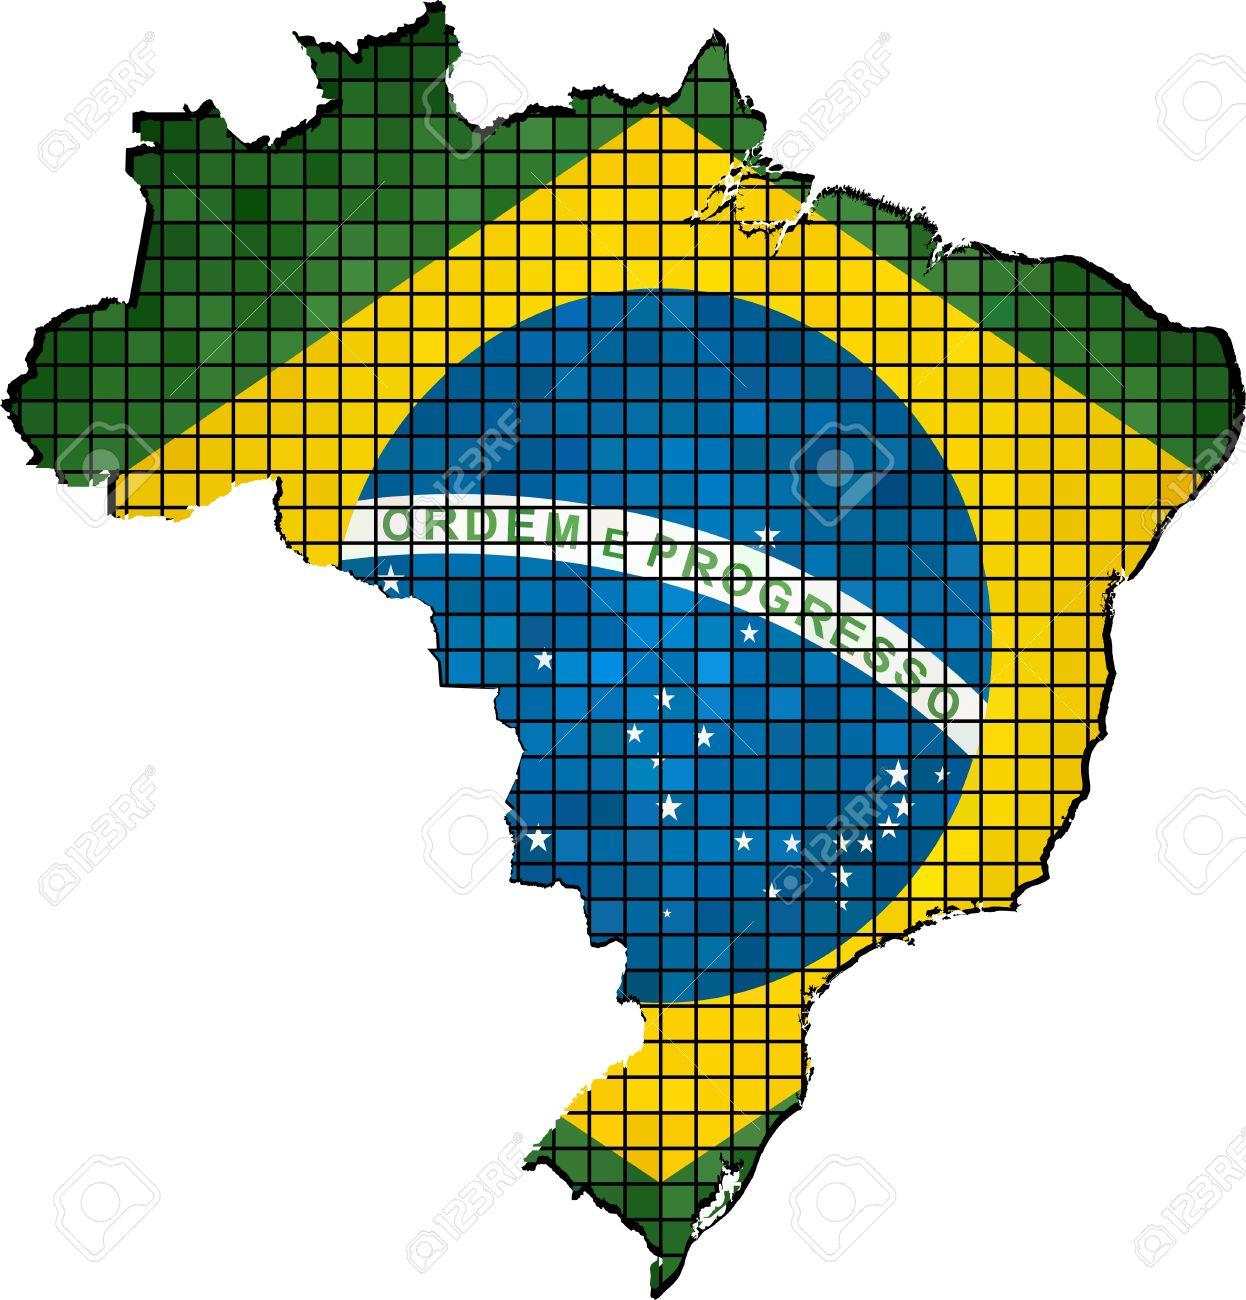 Brazil Map With Flag Inside, Map Of Brazil - Brazilian National ...